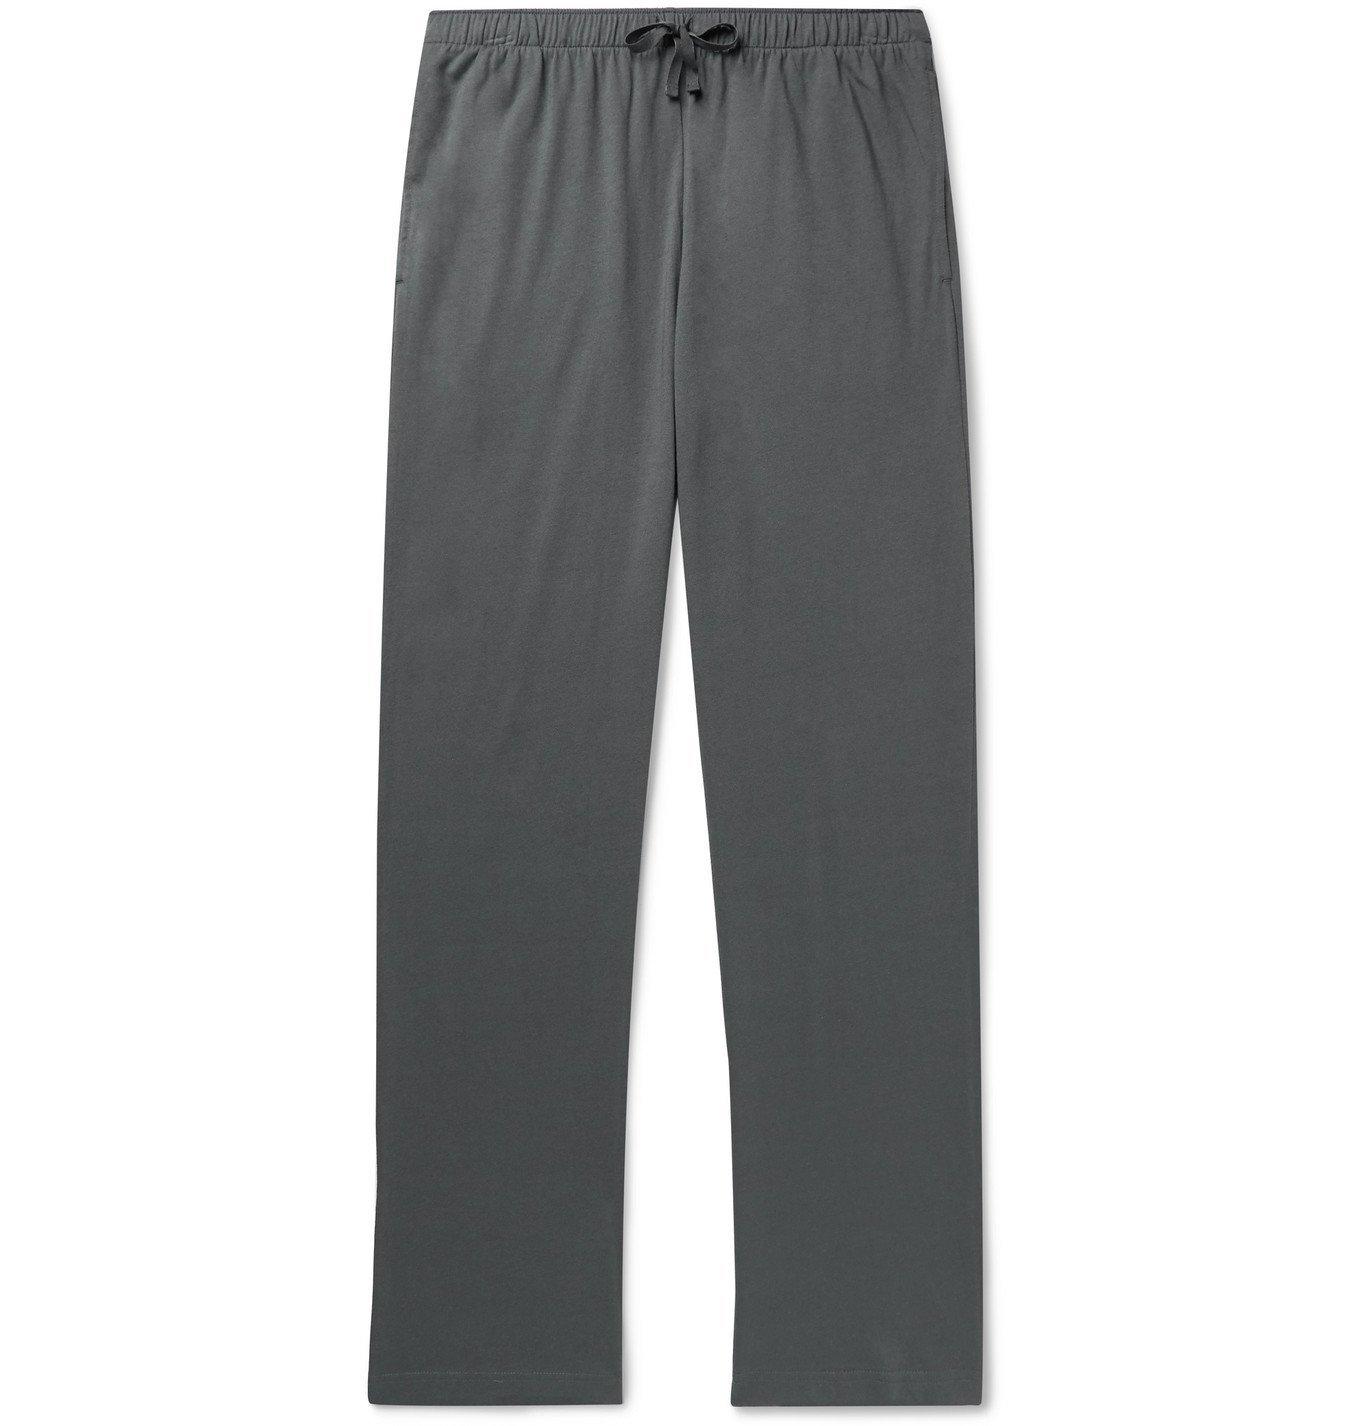 Sunspel - Lounge Cotton and Modal-Blend Jersey Pyjama Trousers - Gray